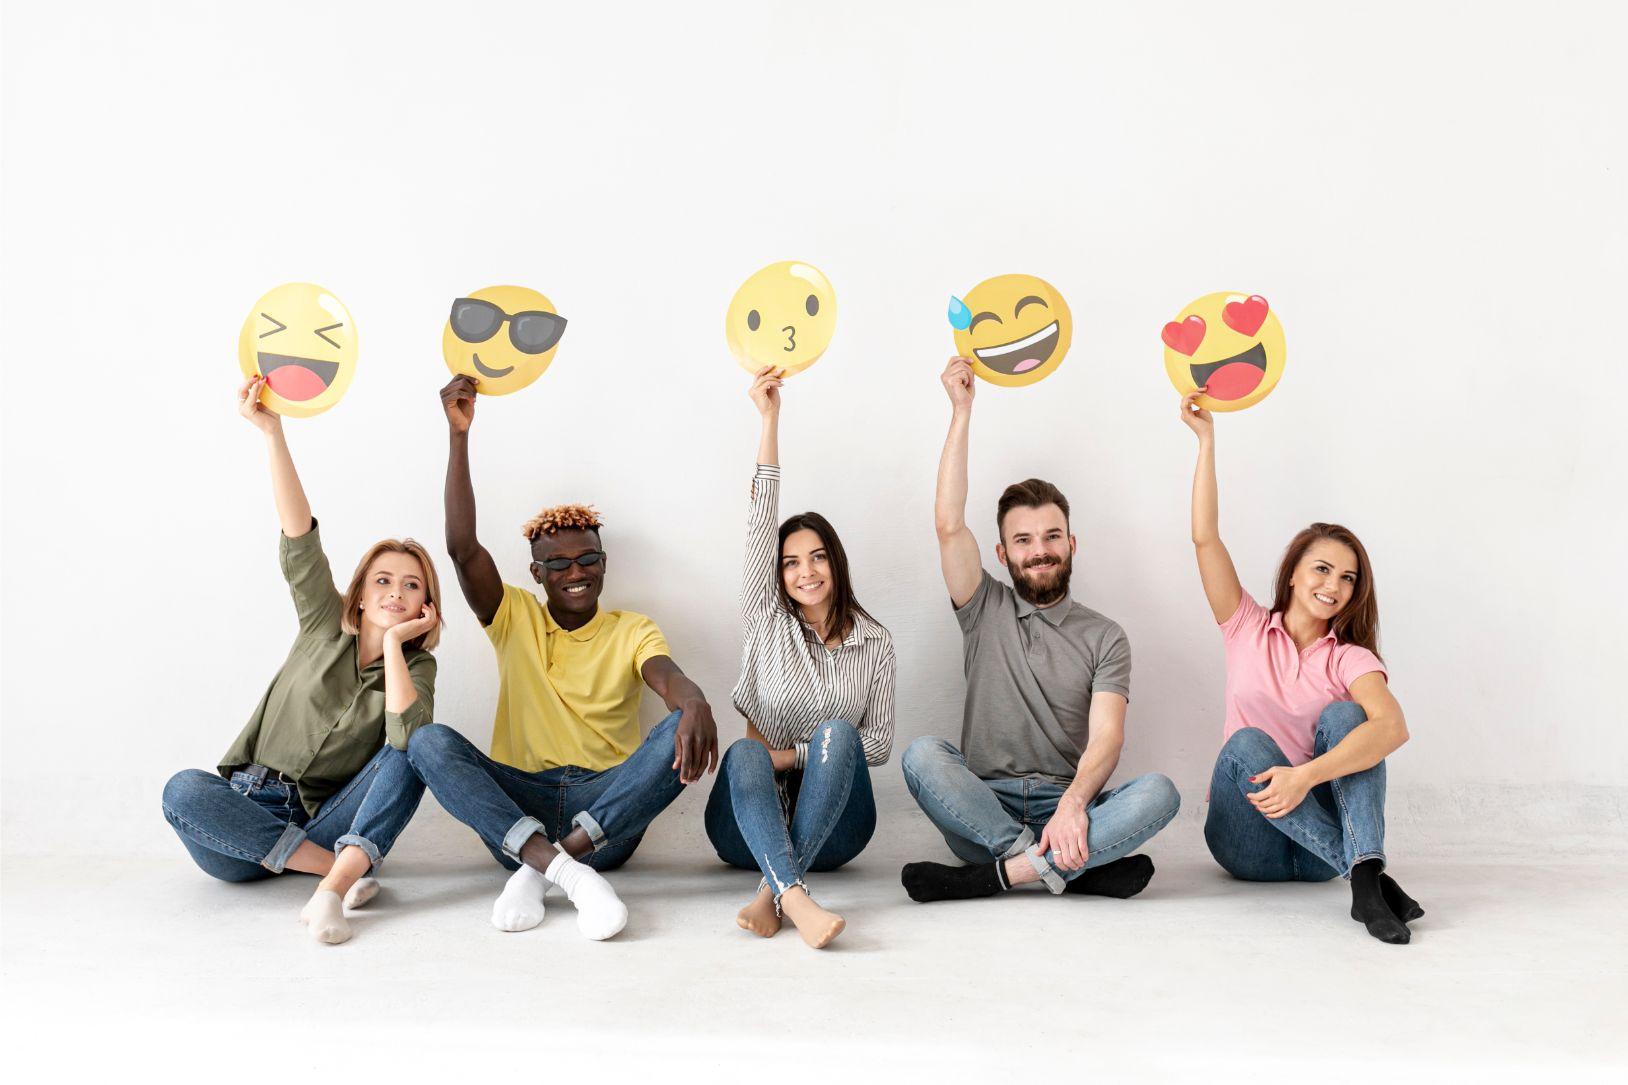 Ksi-Werbeartikel.de beliebte Ferienjobs